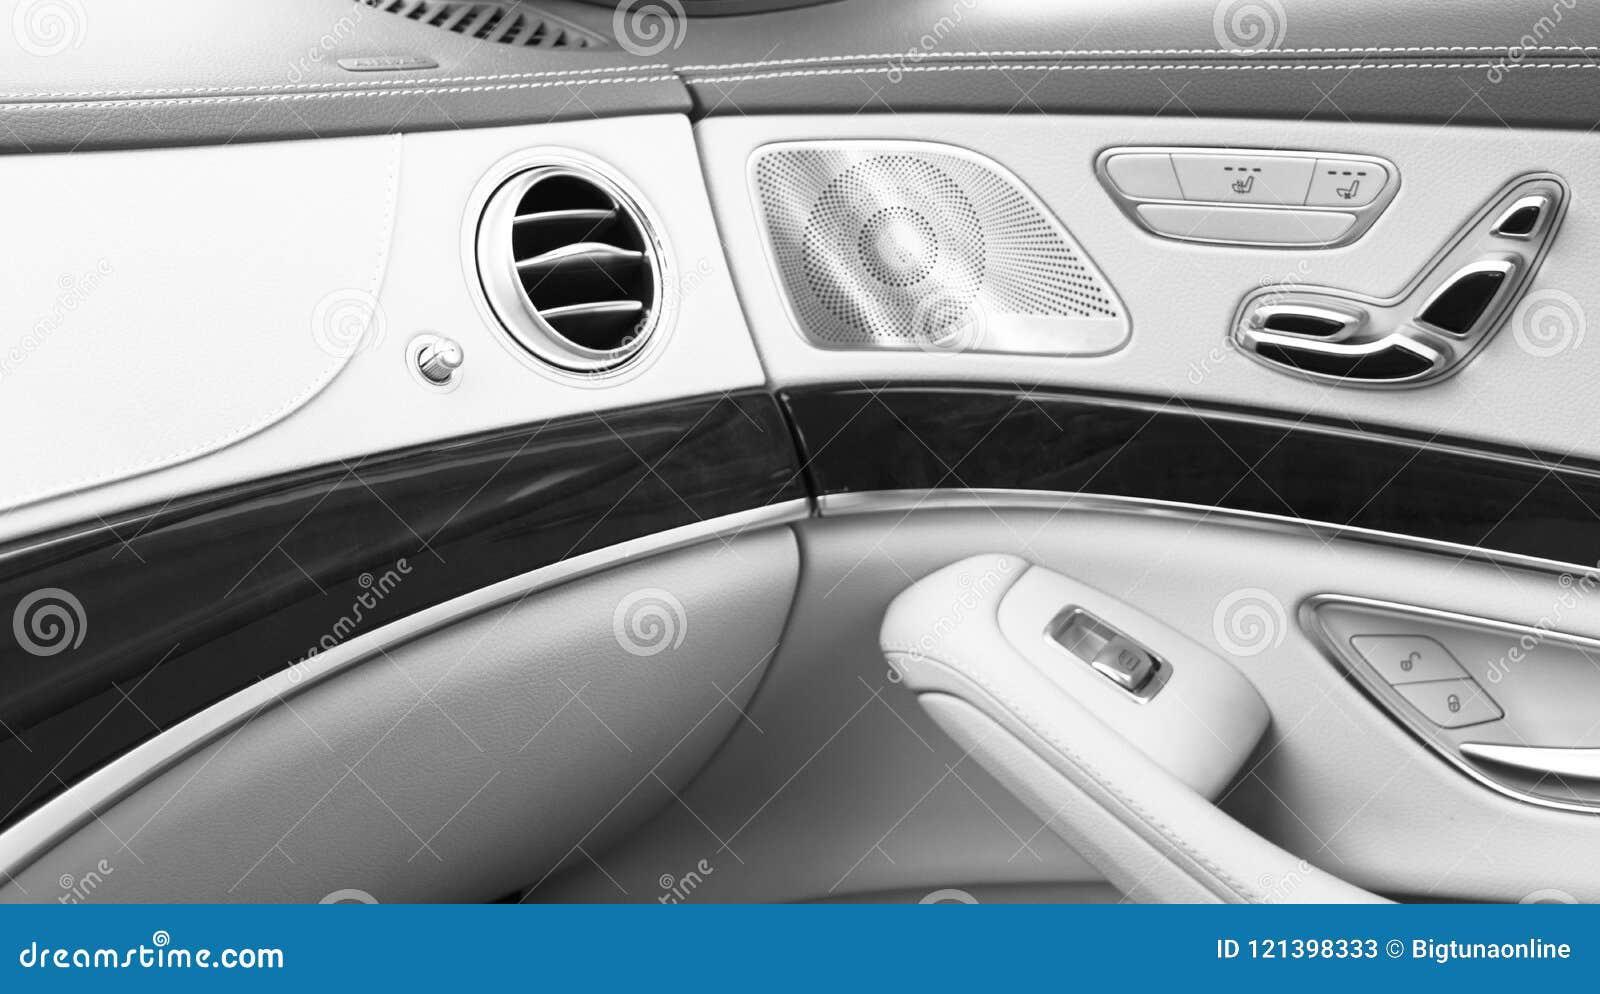 Ac Ventilation Deck Luxury Car Interior Door Handle With Power Seat